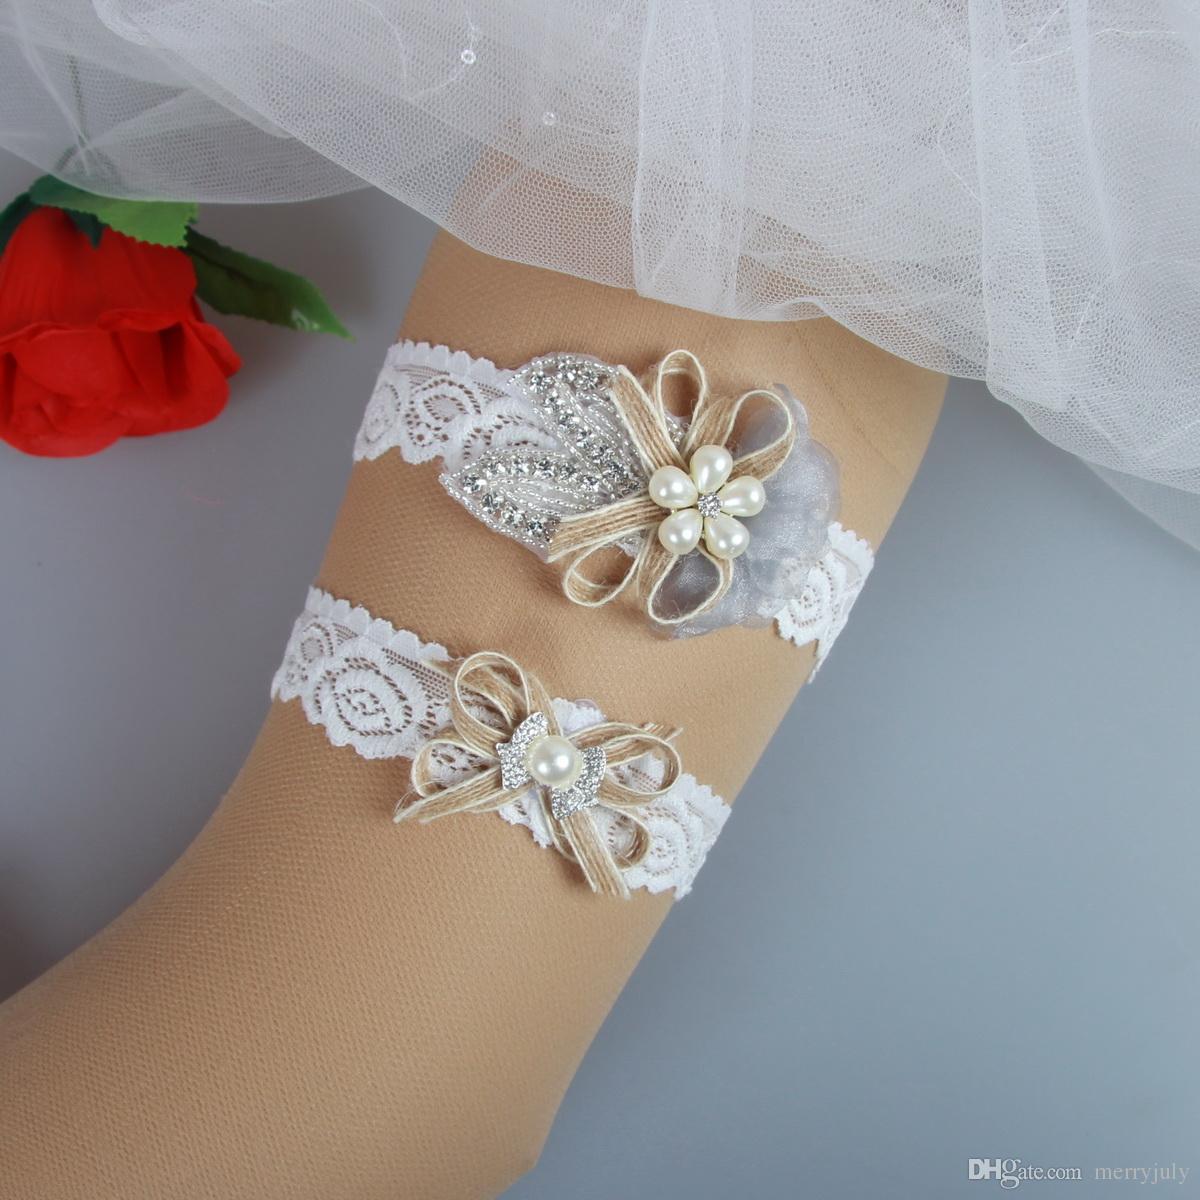 Vintage Lace Wedding Garter Set: Country Rustic Burlap Lace Wedding Bridal Garter Set